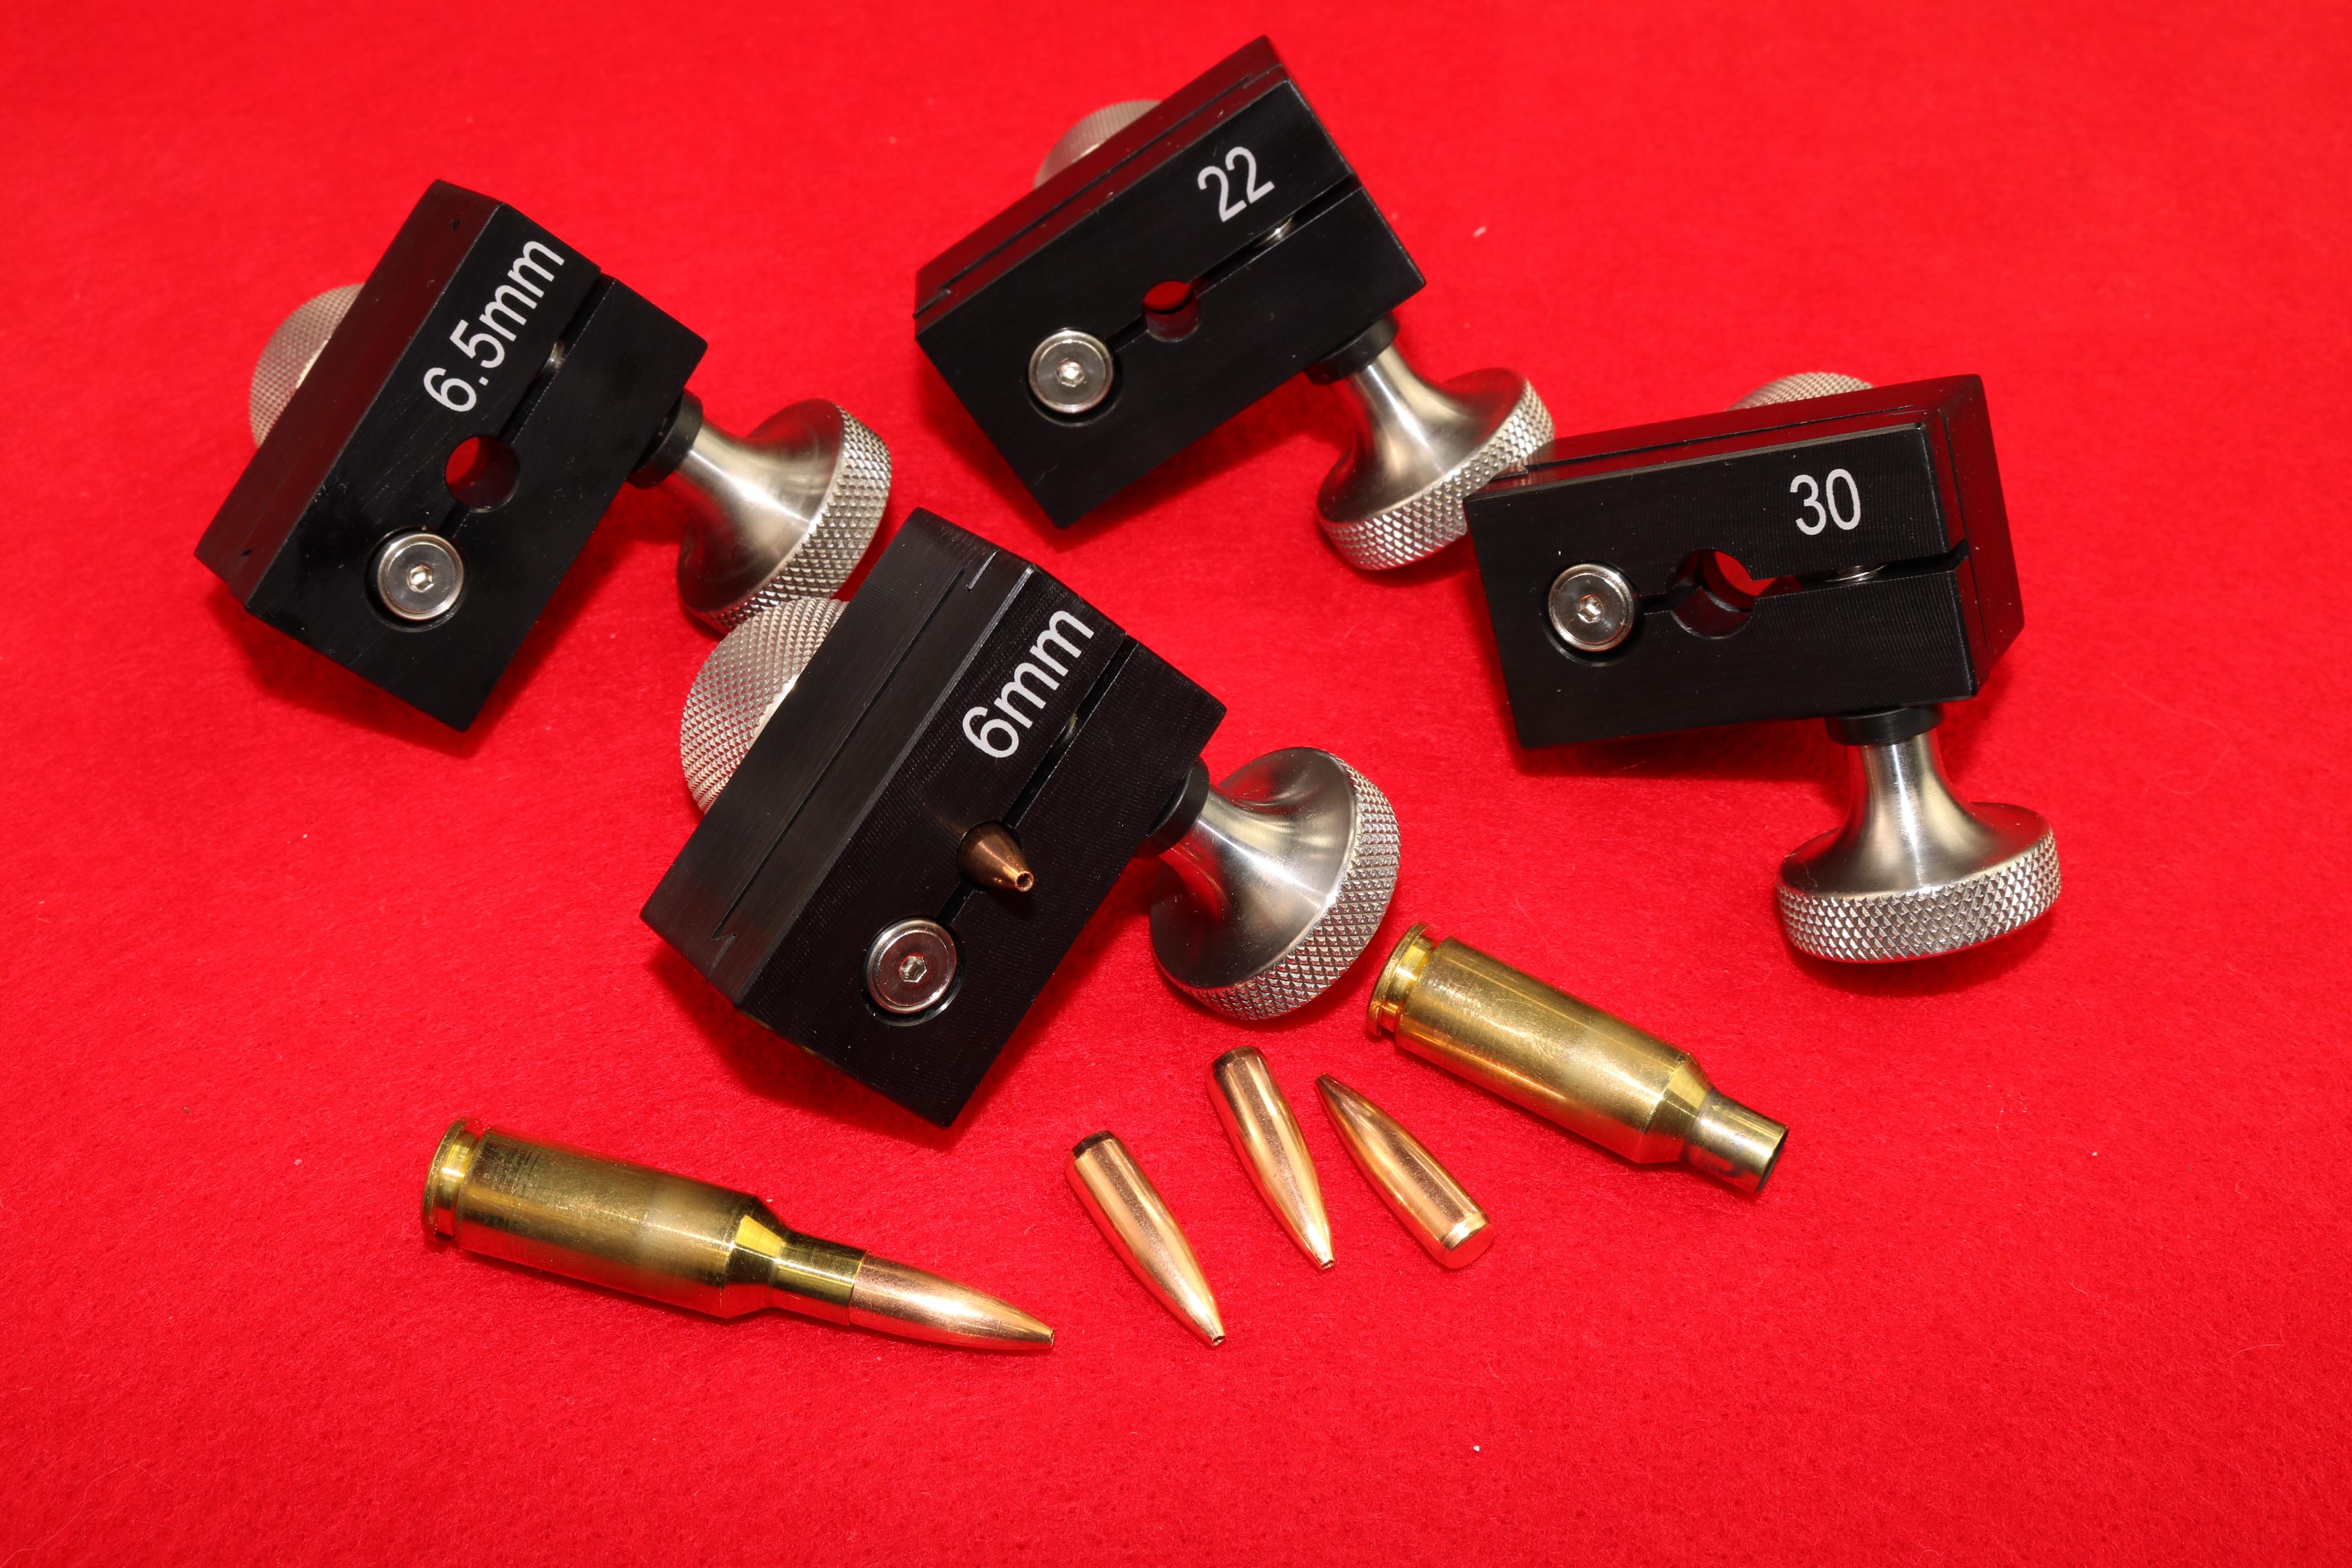 New PMA Tool Bullet Pullers